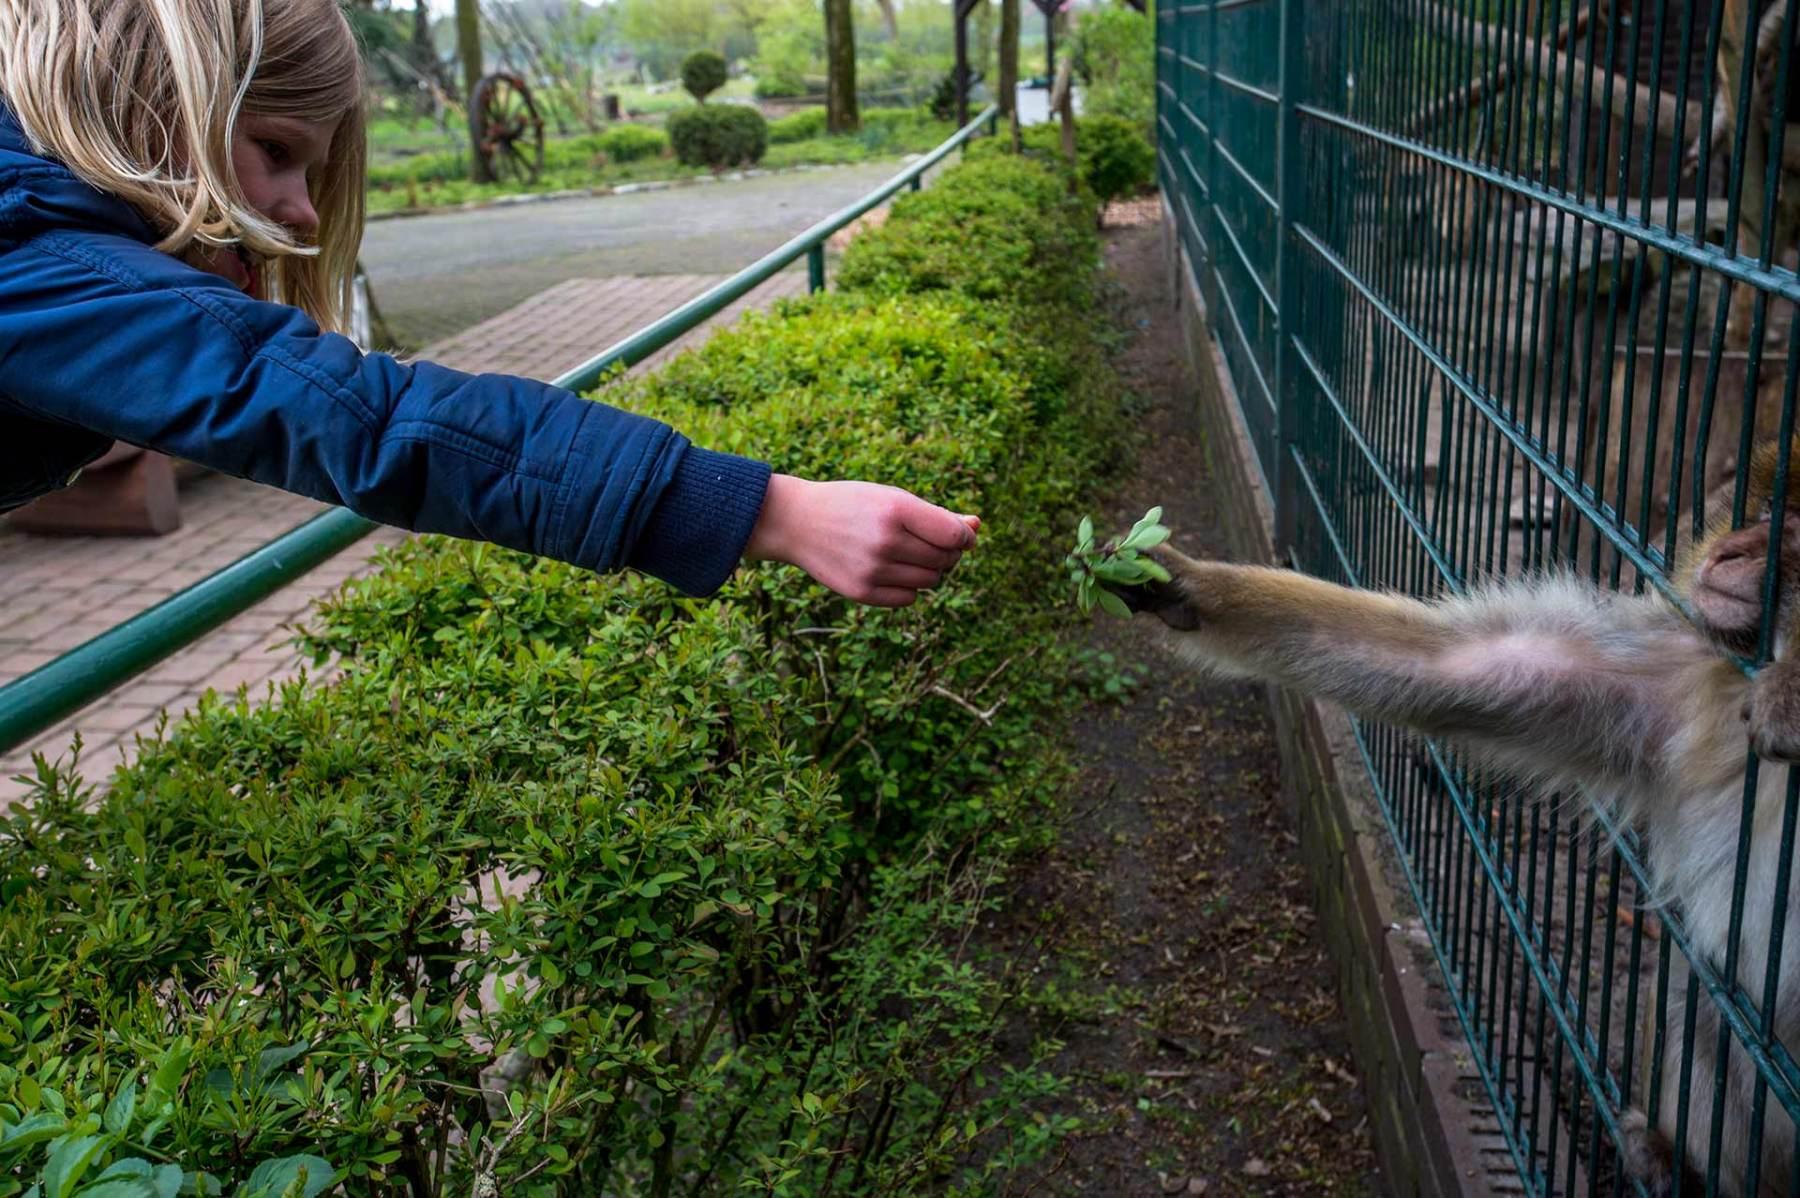 Barbary macaque. Germany, 2016. JMcArthur / Born Free Foundation